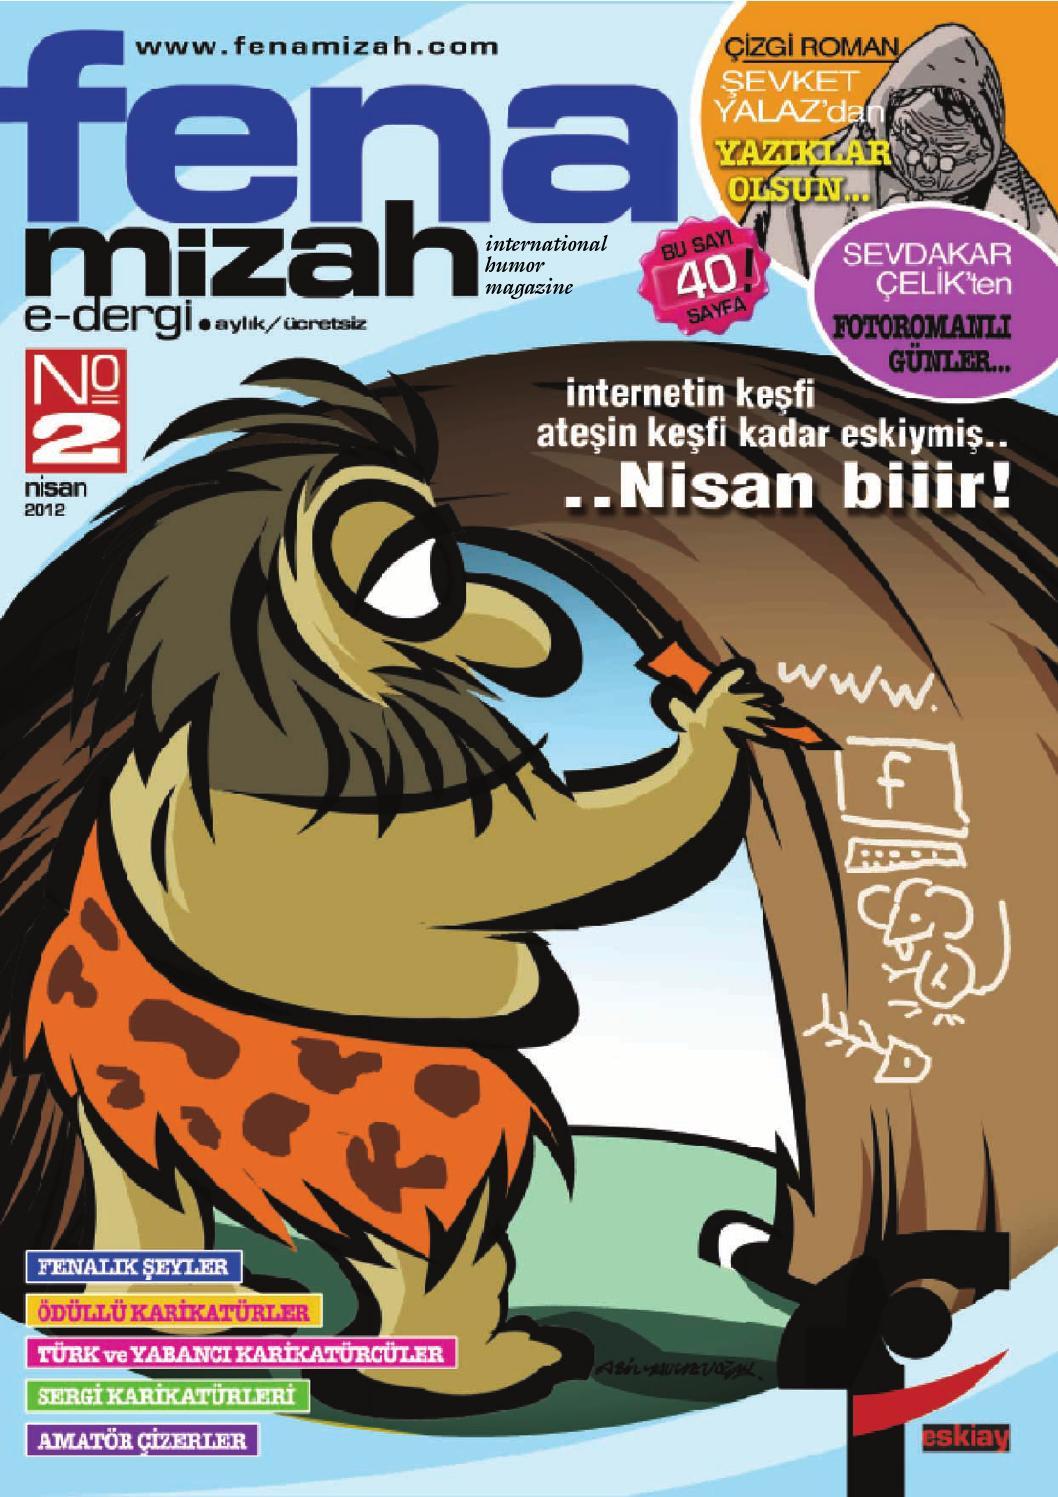 Fenamizah No 02 April 2012 By Fenamizah E Magazine Issuu